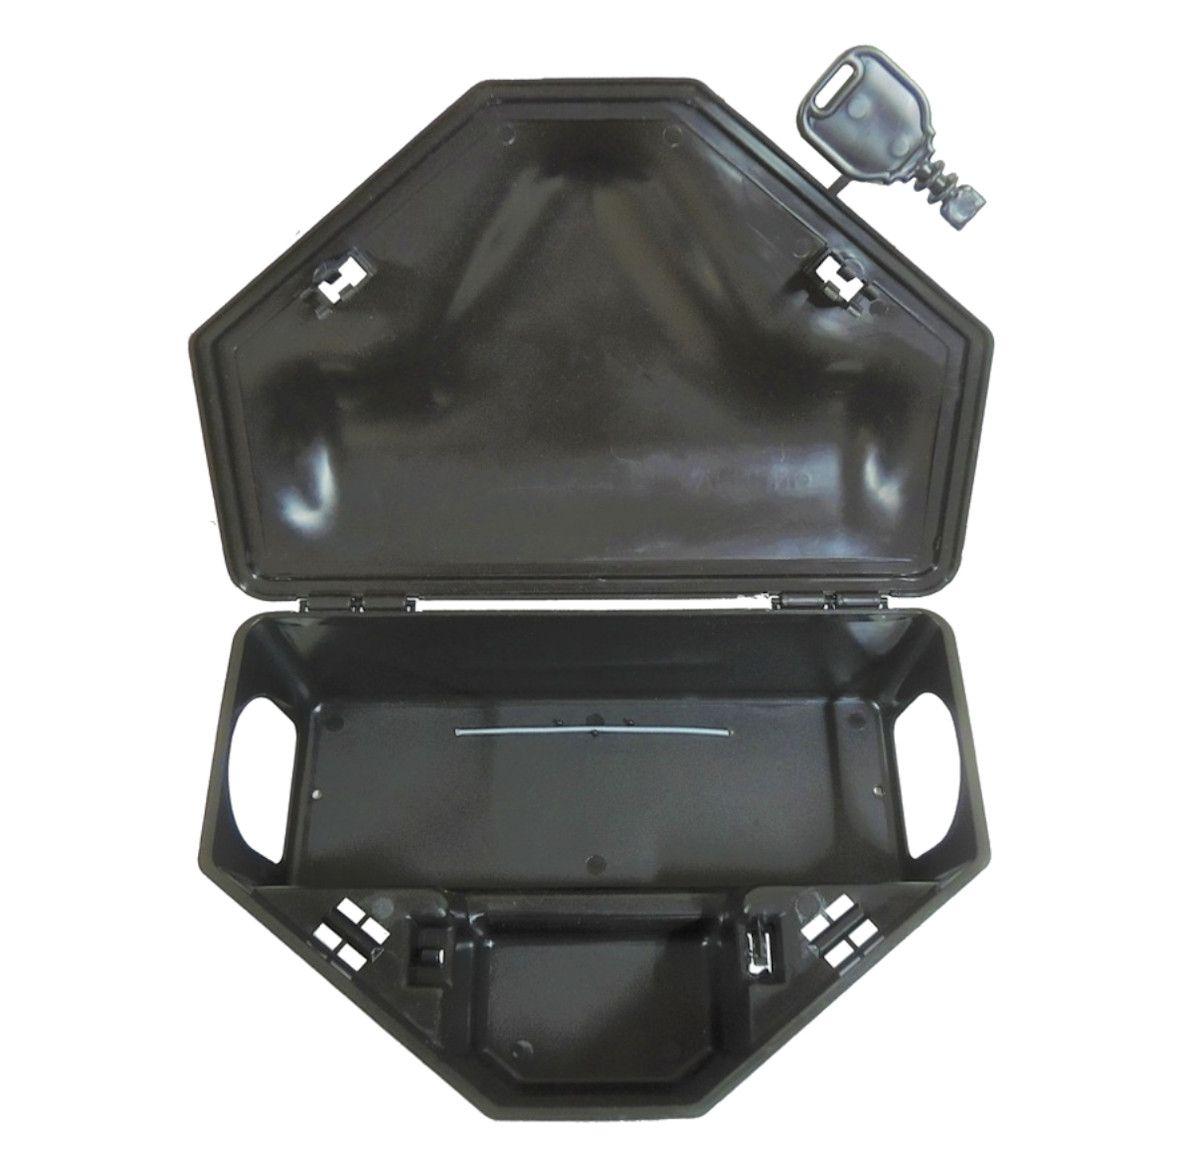 KIT 35 Porta Iscas Resistentes 2 TRAVAS c/ Chave Mata Ratos